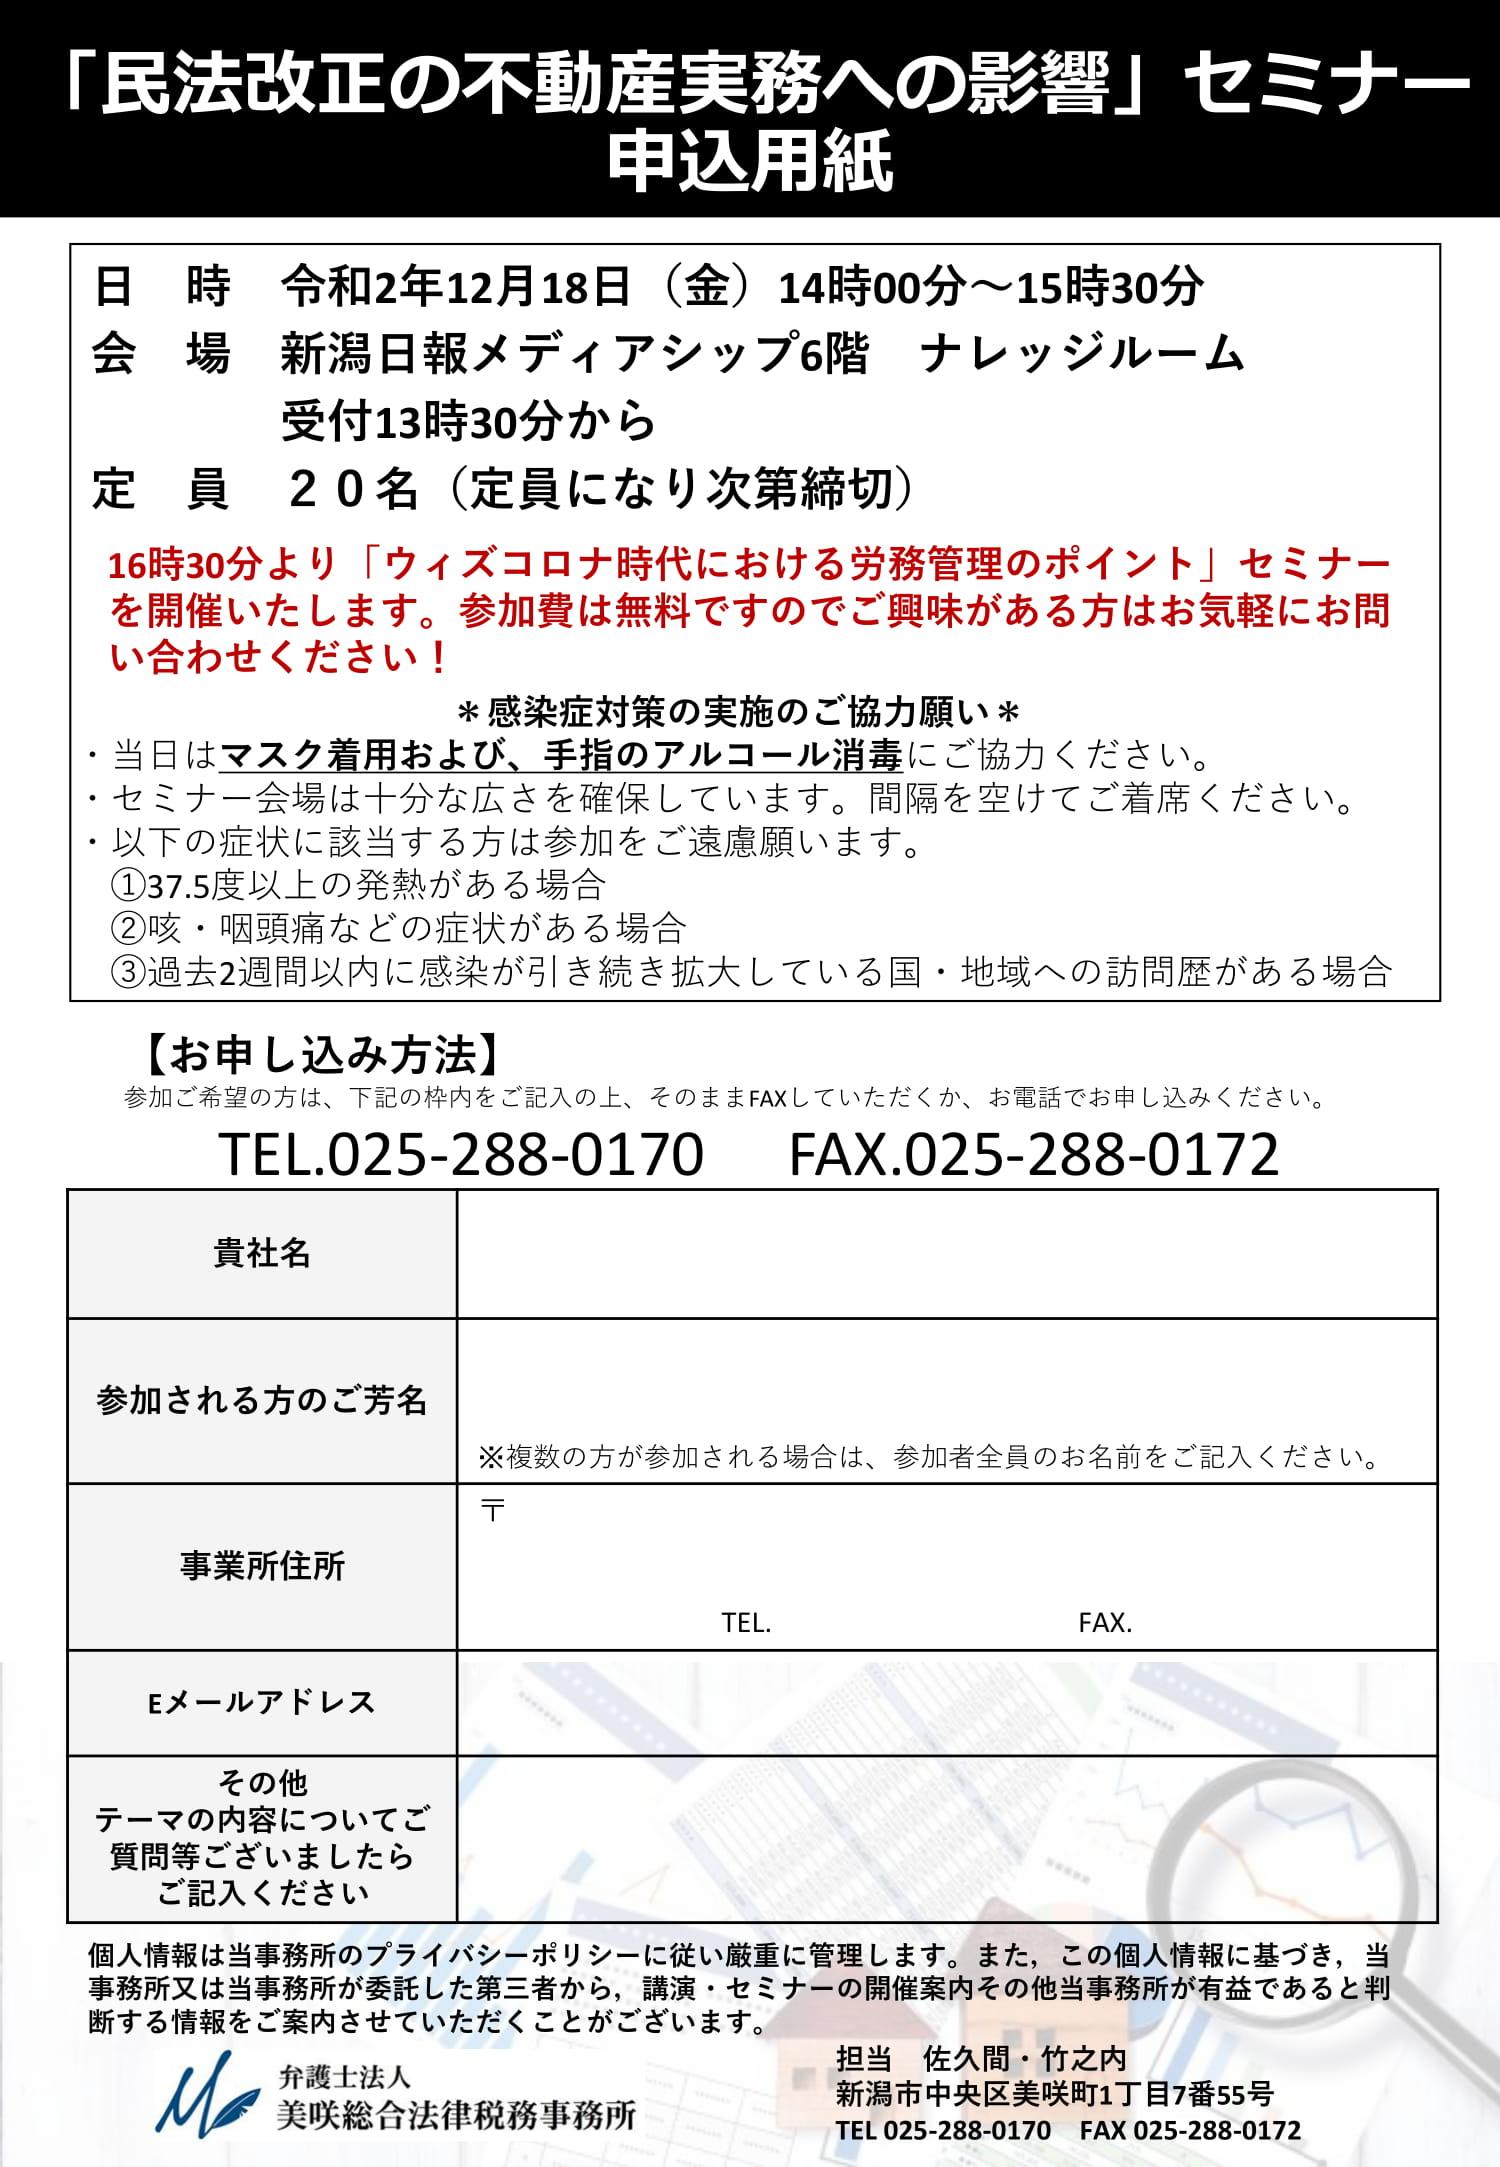 12月18日開催不動産セミナー案内 -2.jpg